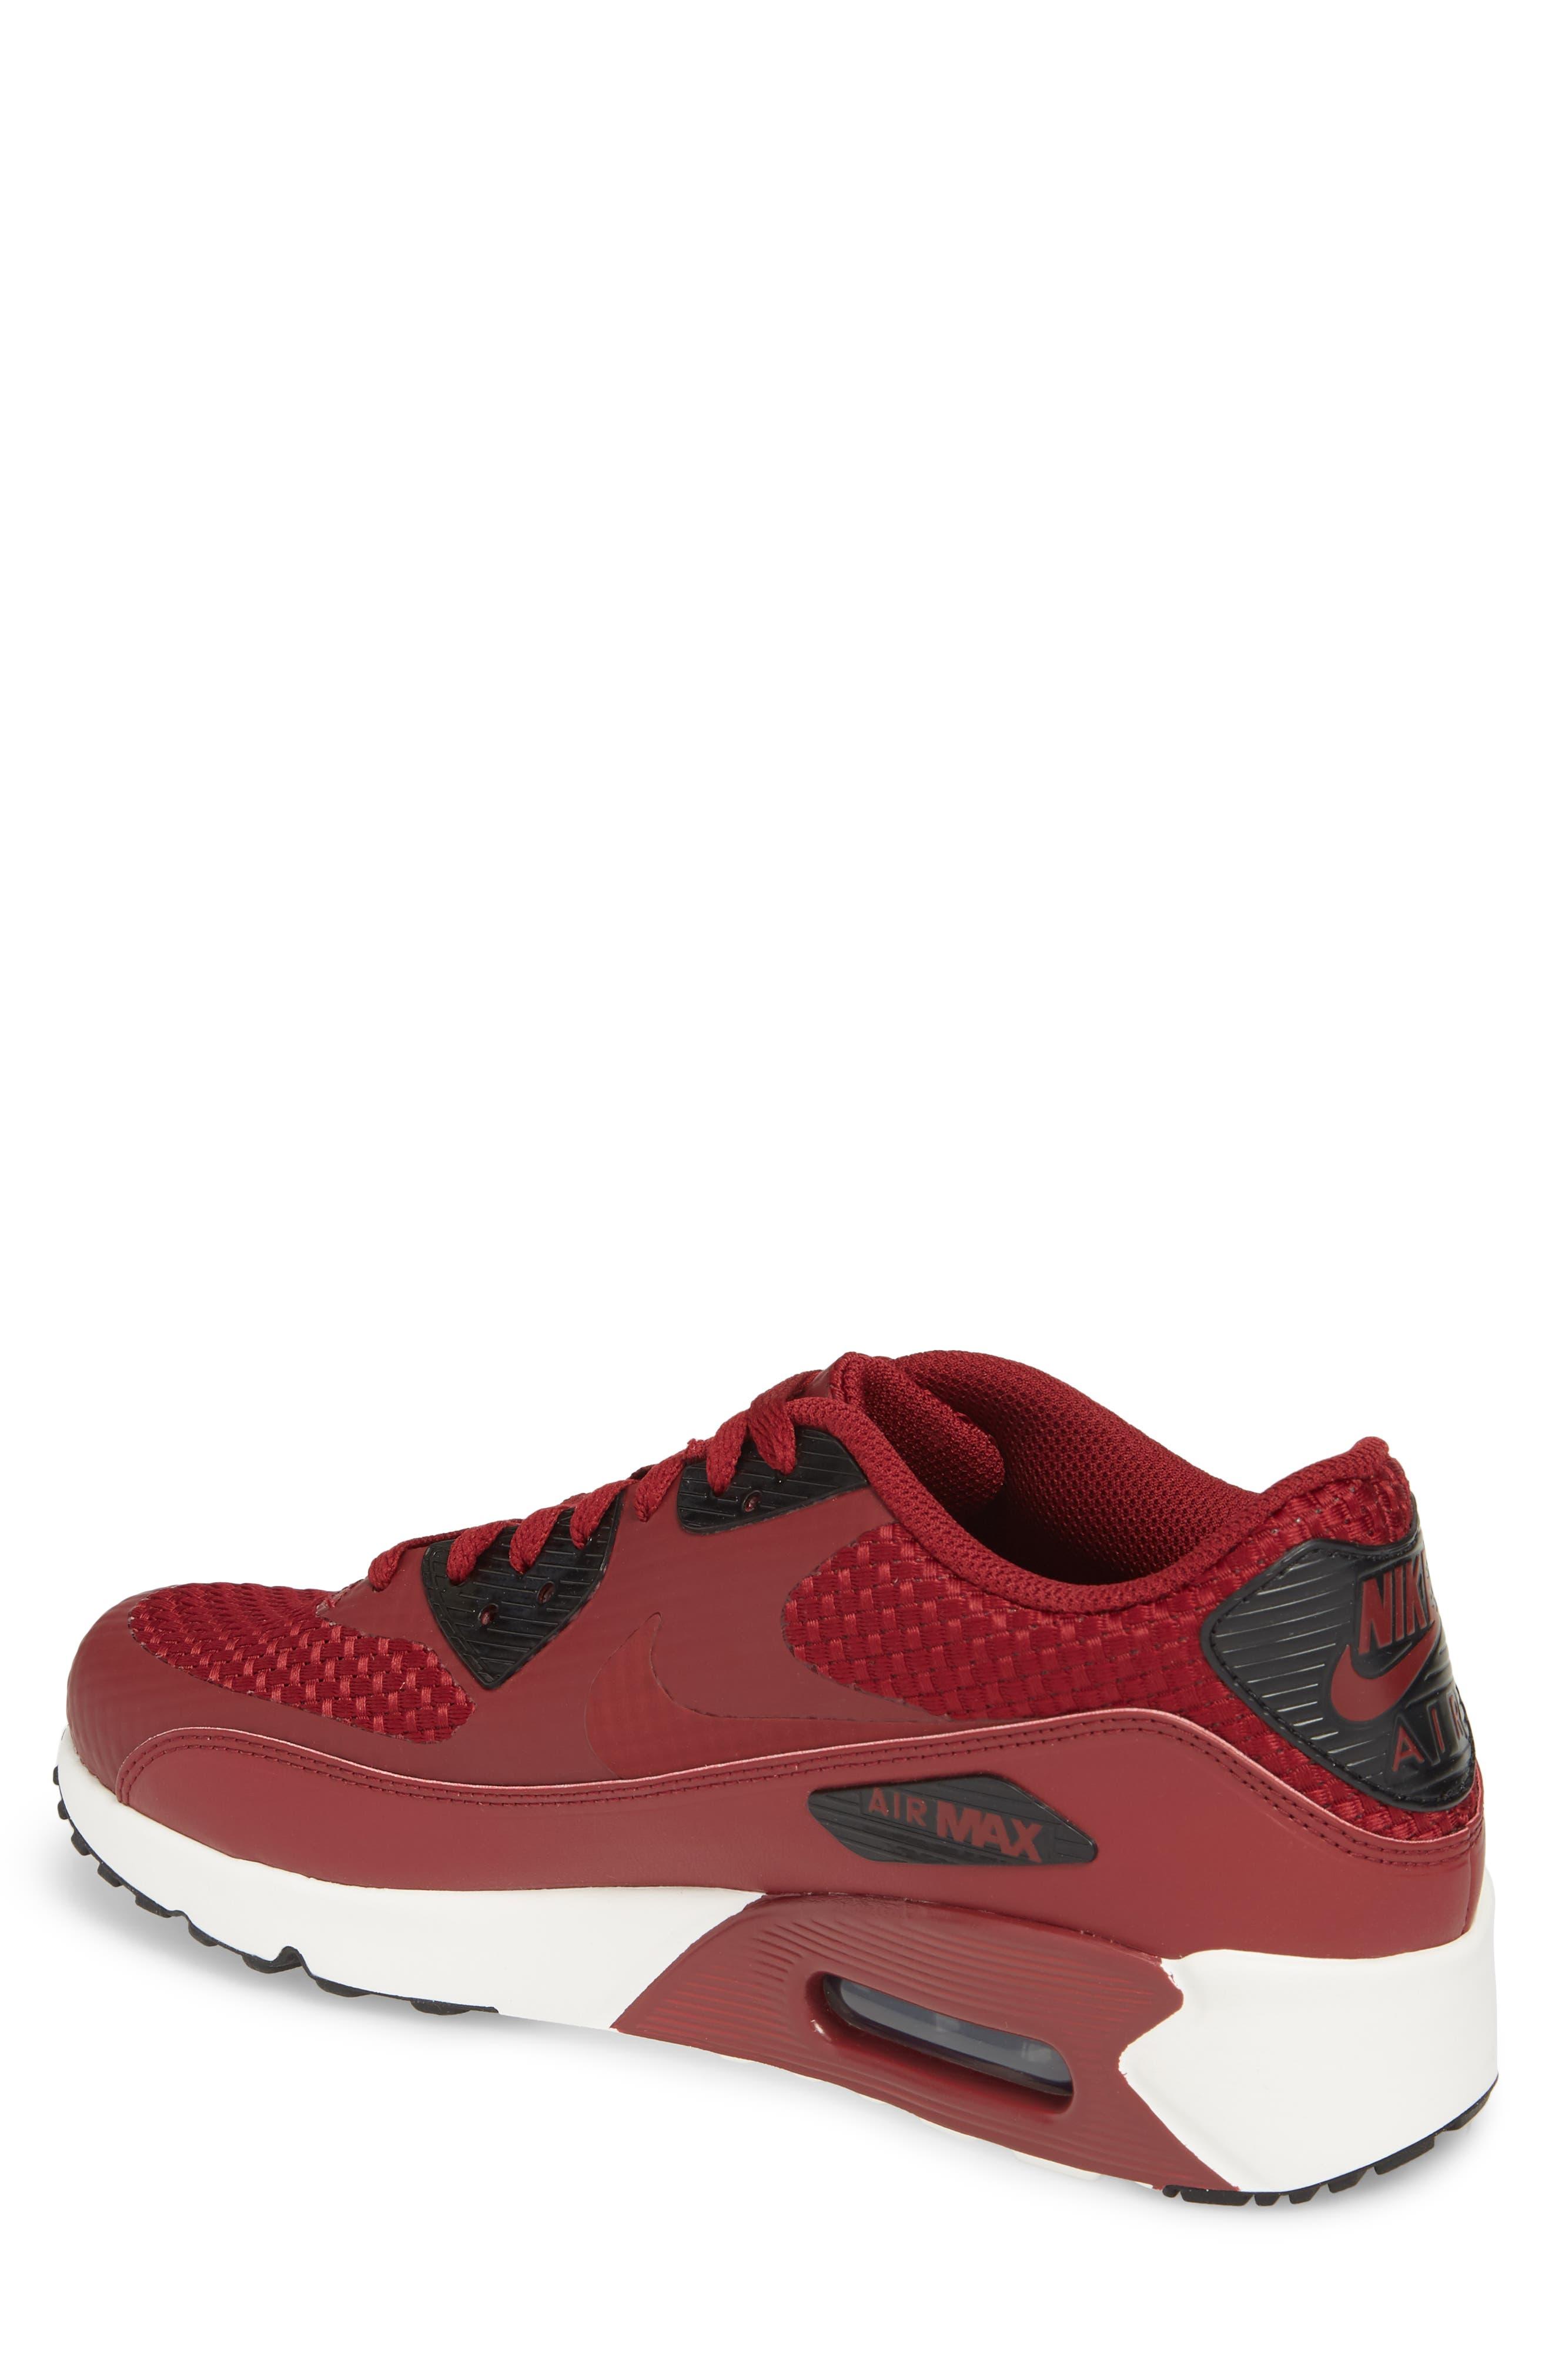 Air Max 90 Ultra 2.0 SE Sneaker,                             Alternate thumbnail 9, color,